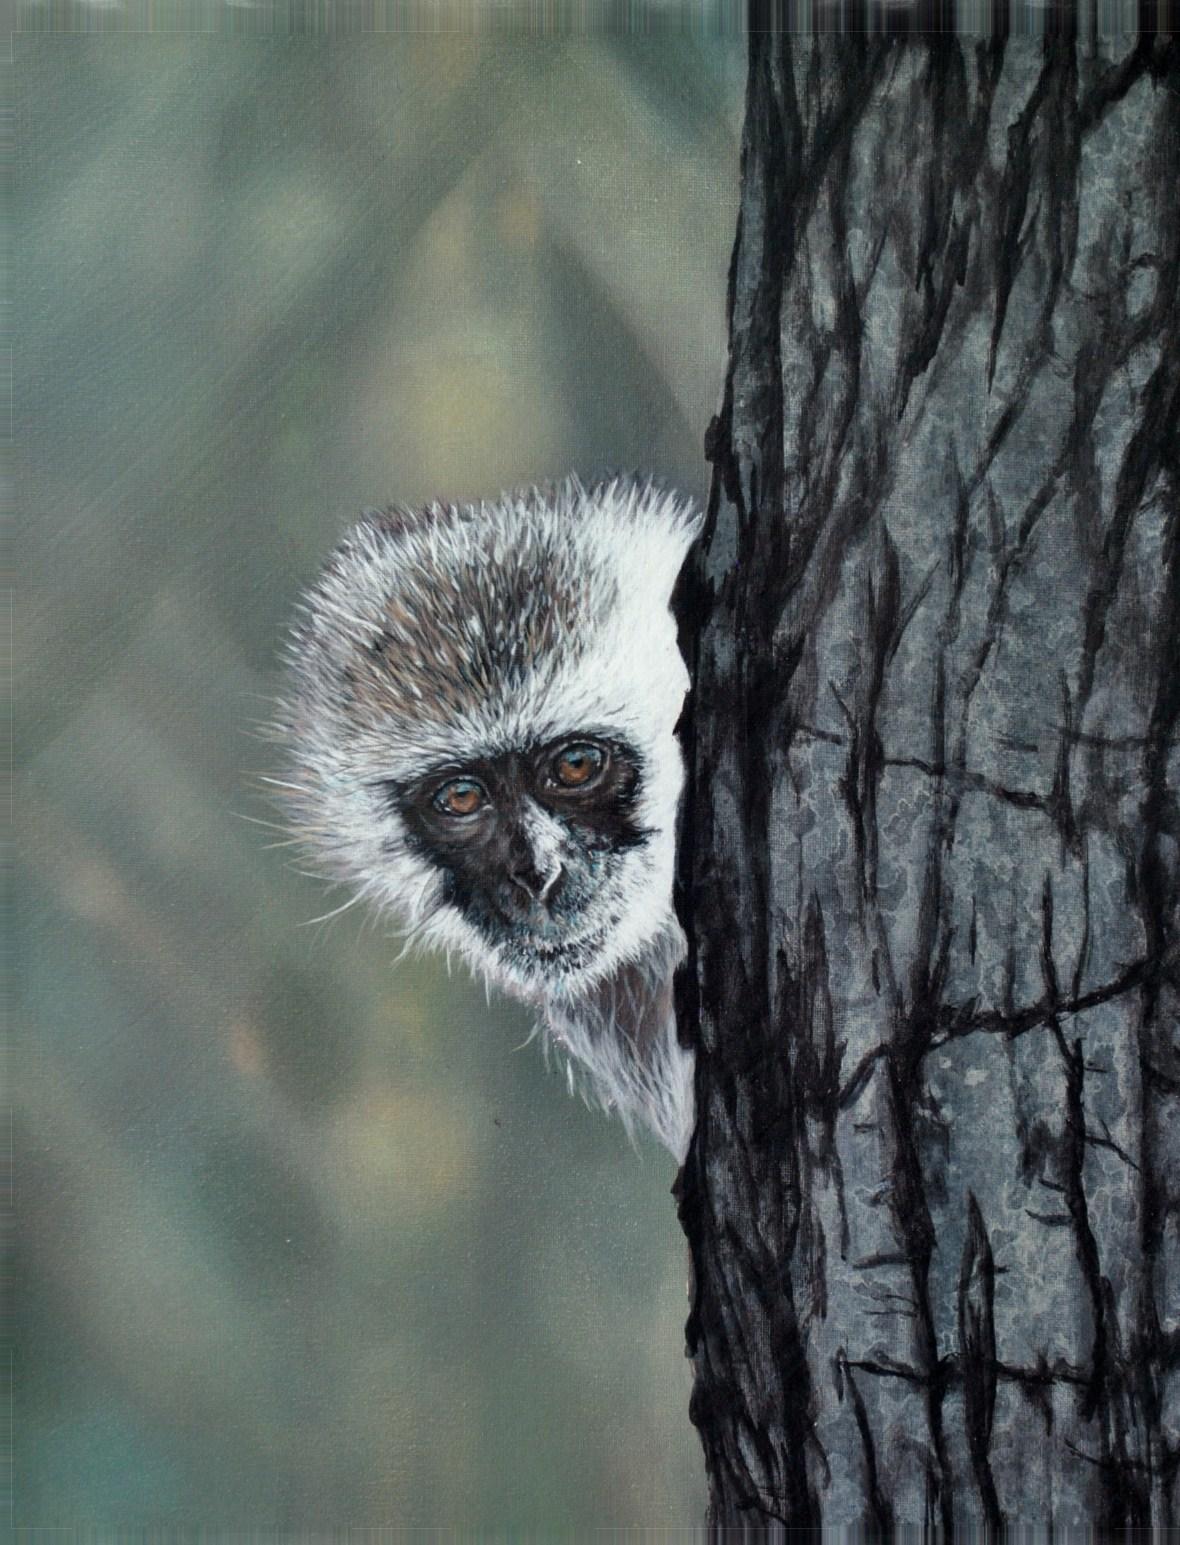 """Peeping Tom"", 40cm x 50cm, Acrylic on Canvas (SOLD)"